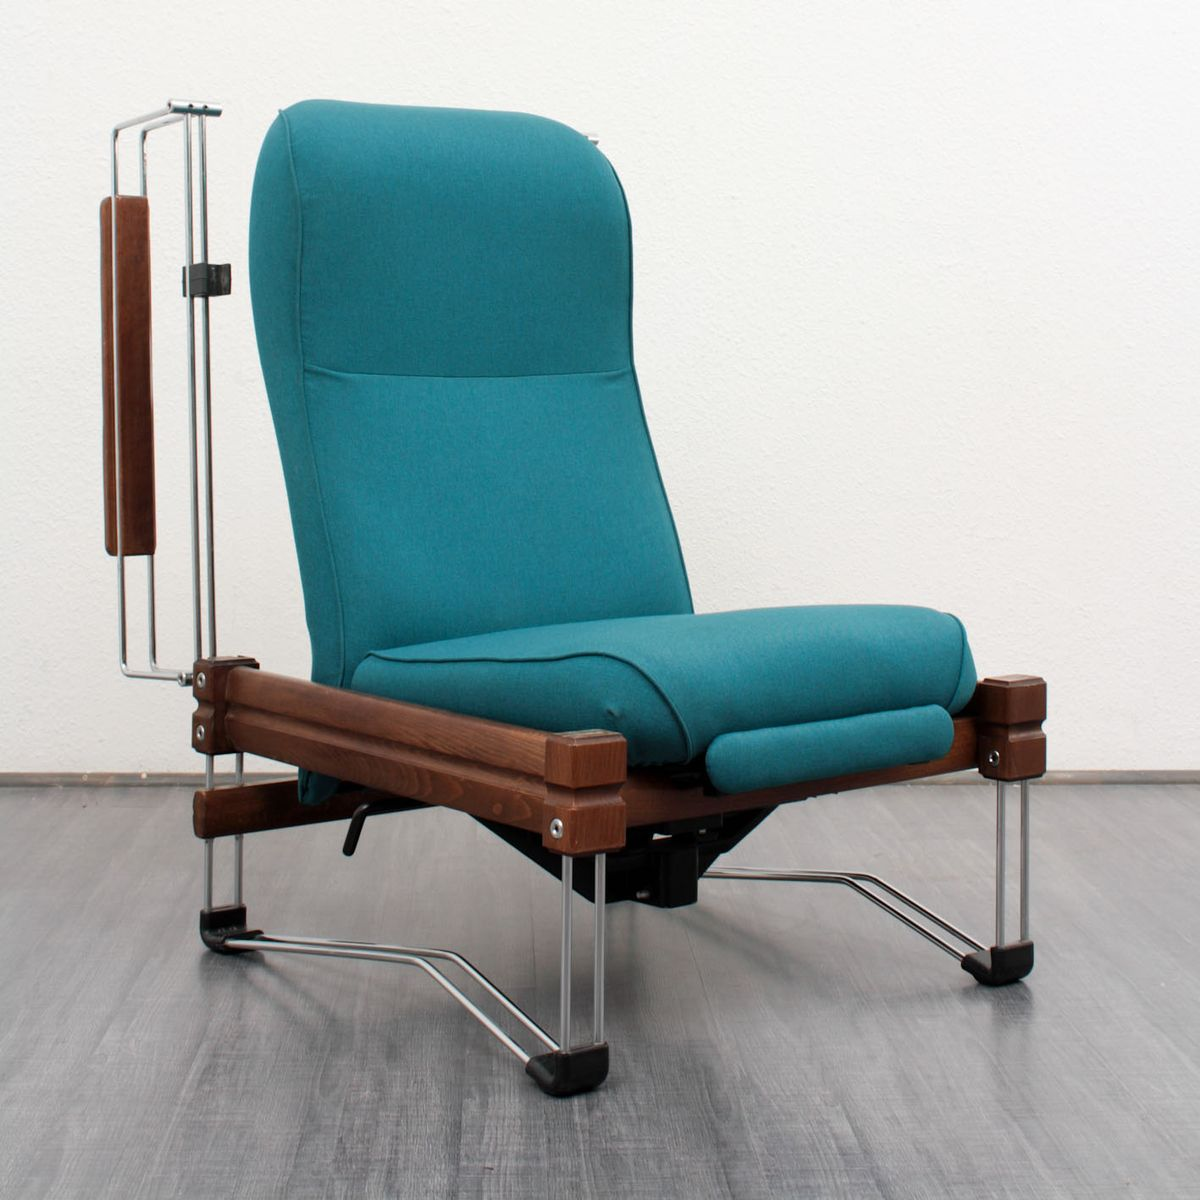 vintage lounge sessel aus holz mit verchromten gestell bei pamono kaufen. Black Bedroom Furniture Sets. Home Design Ideas